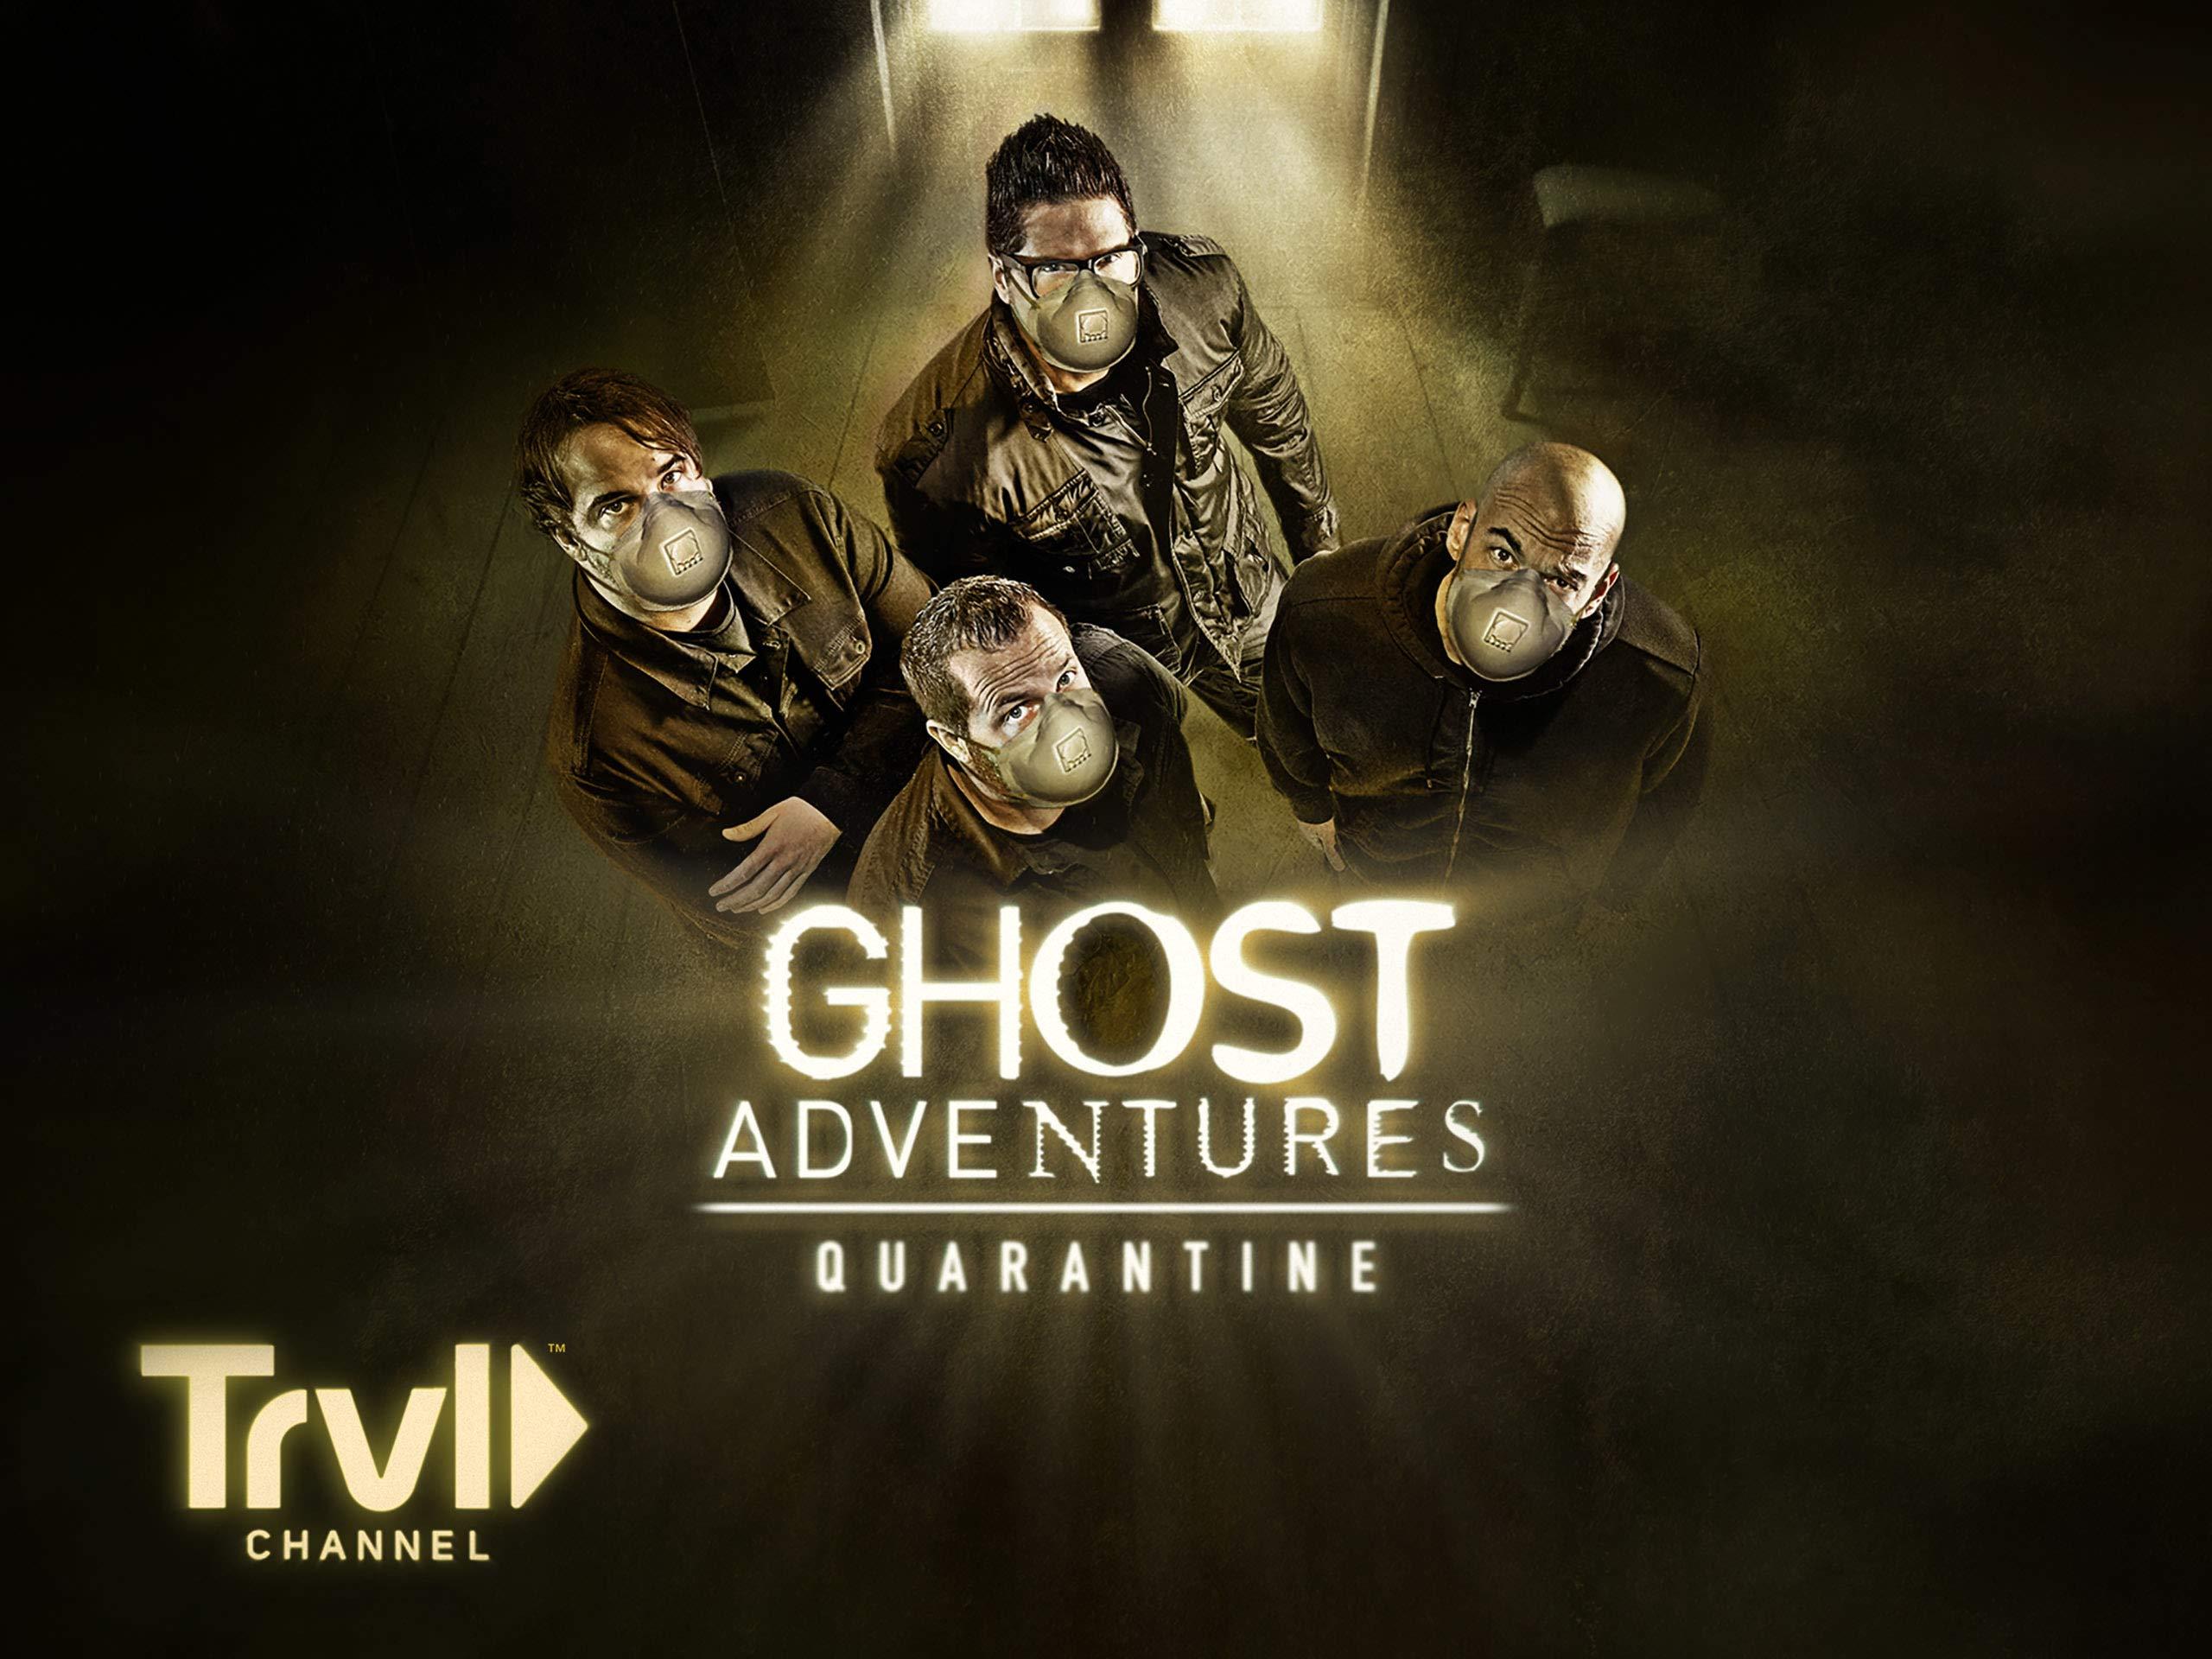 Watch Ghost Adventures Quarantine Season 1 Prime Video